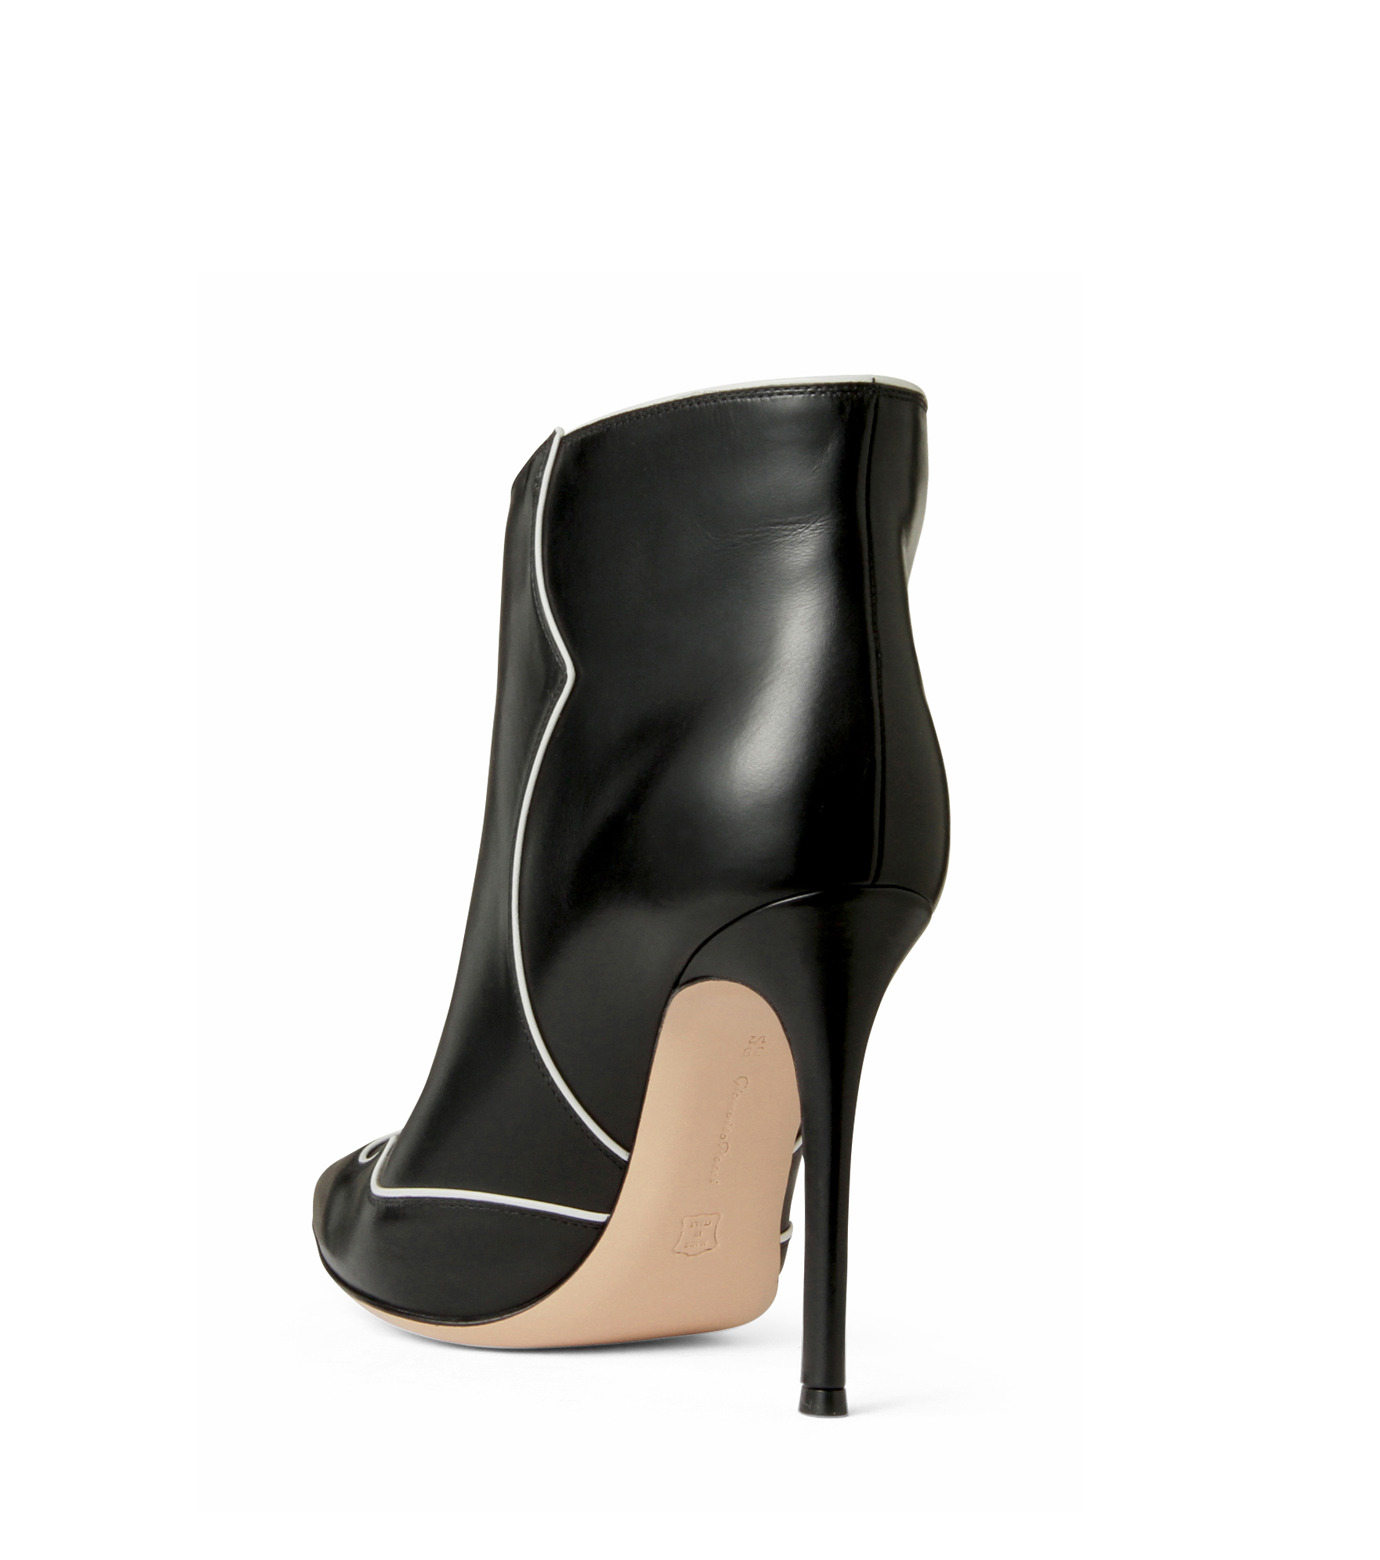 Gianvito Rossi(ジャンヴィト ロッシ)のWestern Stitch Bootie-BLACK(シューズ/shoes)-GQ05936-13 拡大詳細画像2